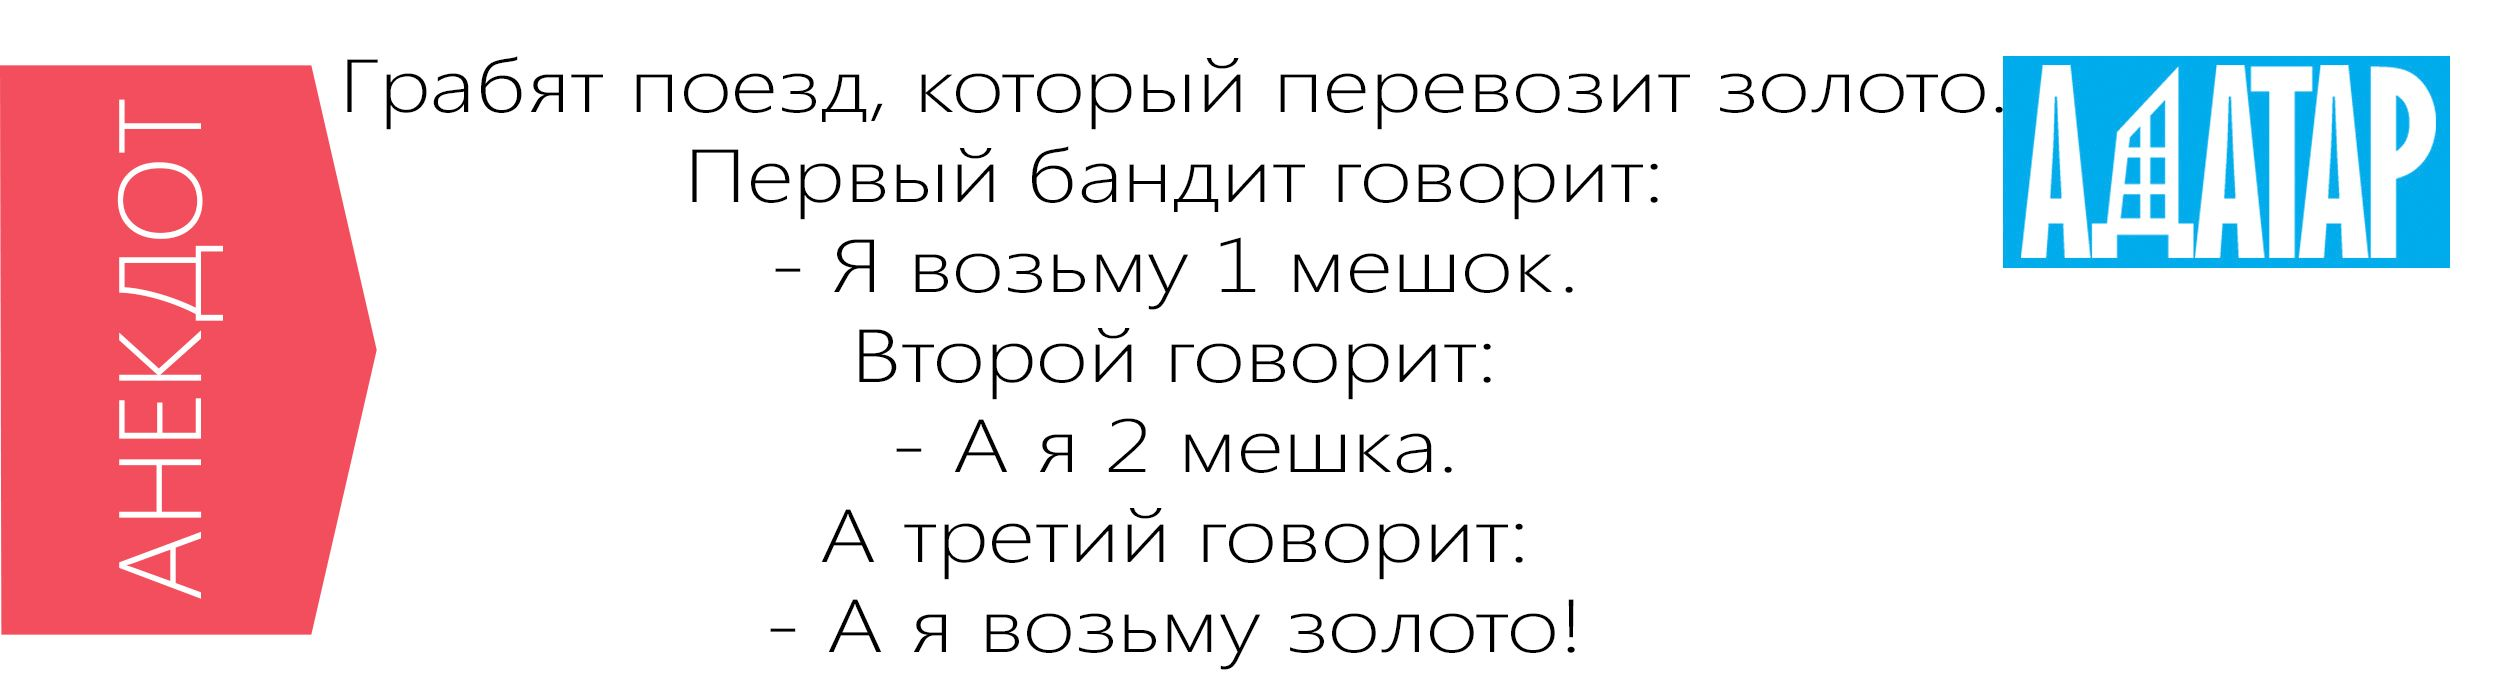 АНЕКДОТ 35.jpg